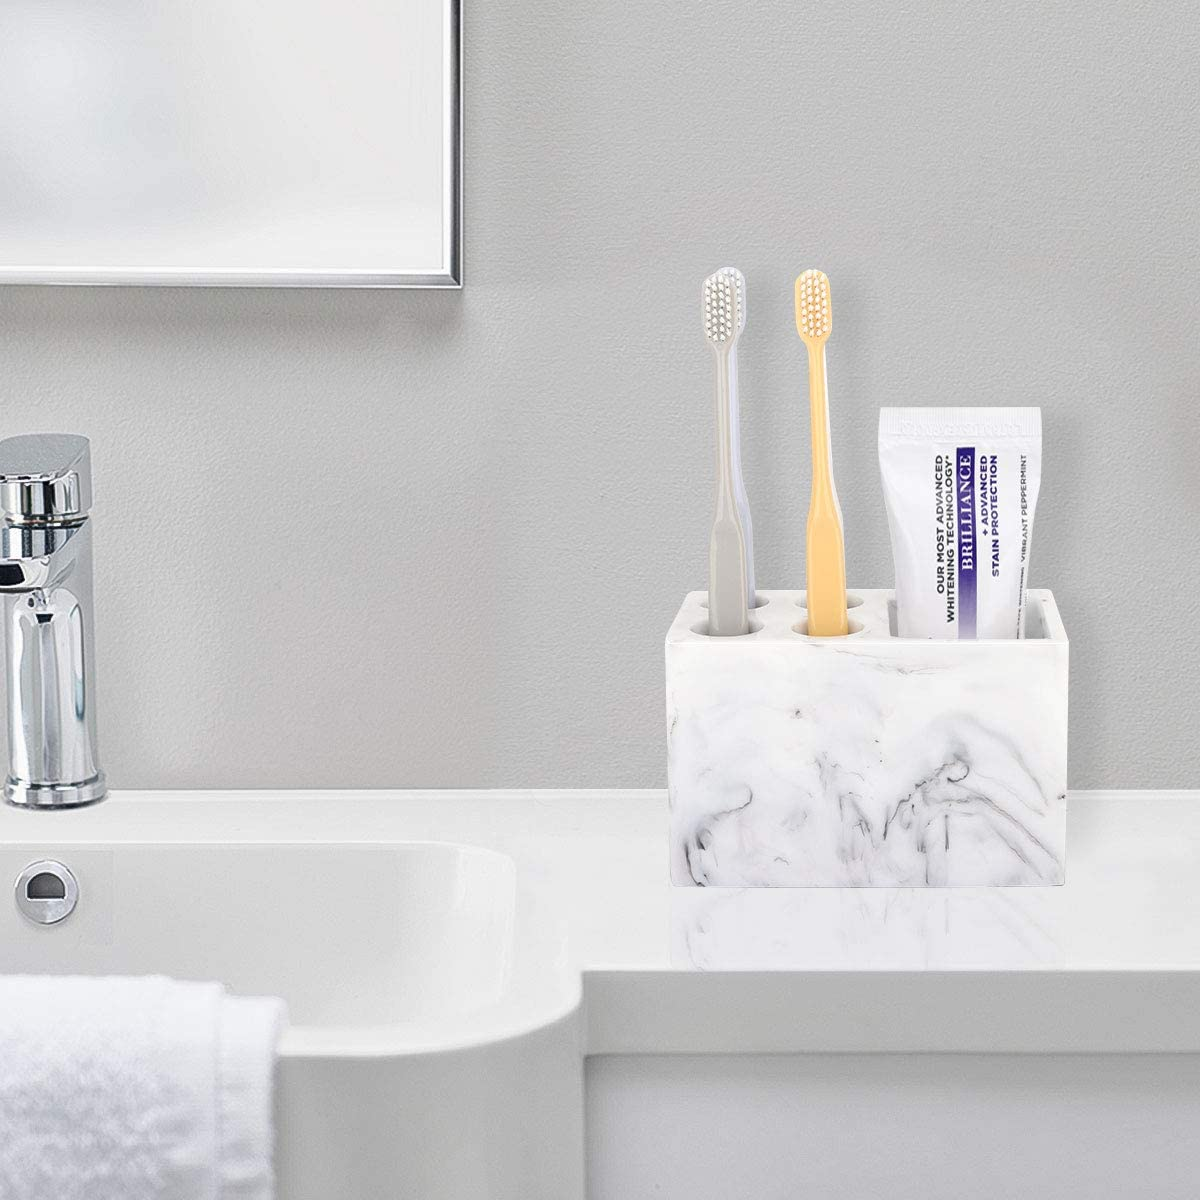 Dark Green Toothpaste Razor Luxspire Resin Toothbrush Holder 3 Slots Hygienic Handmade Toothbrush Storage Stand Dispenser Bathroom Organizer Set for Electric Toothbrush